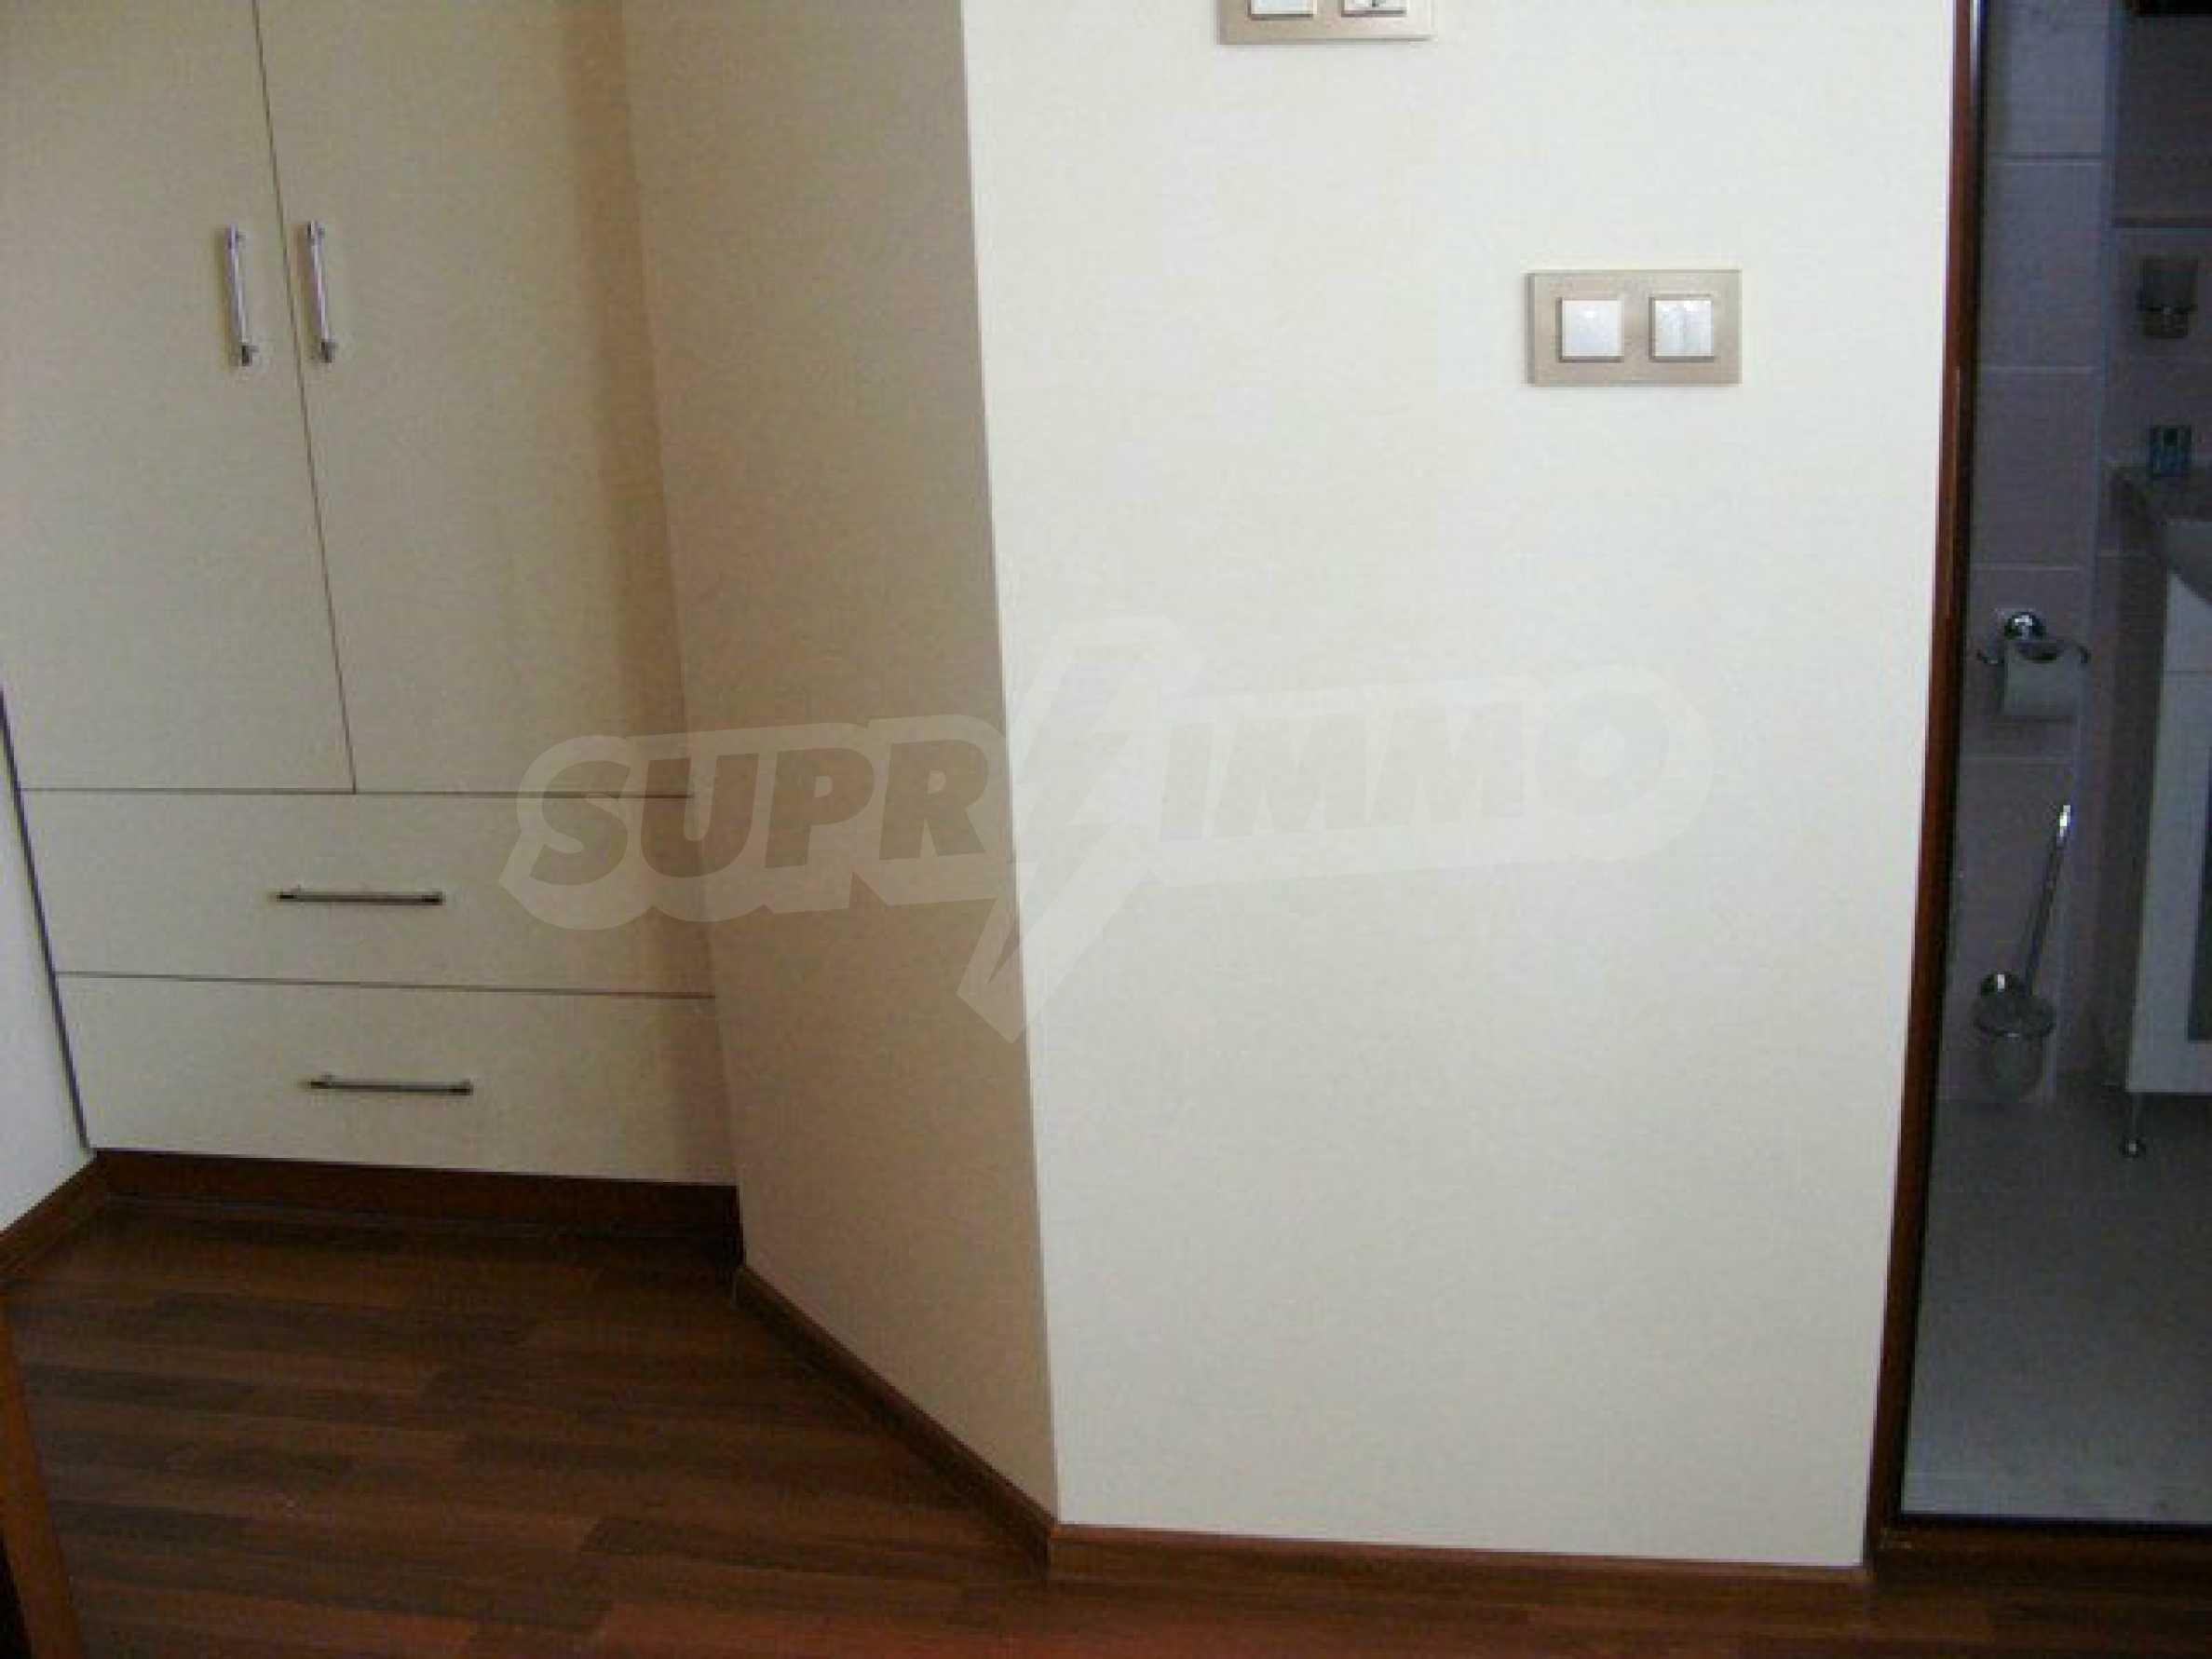 Apartment Deizy 24